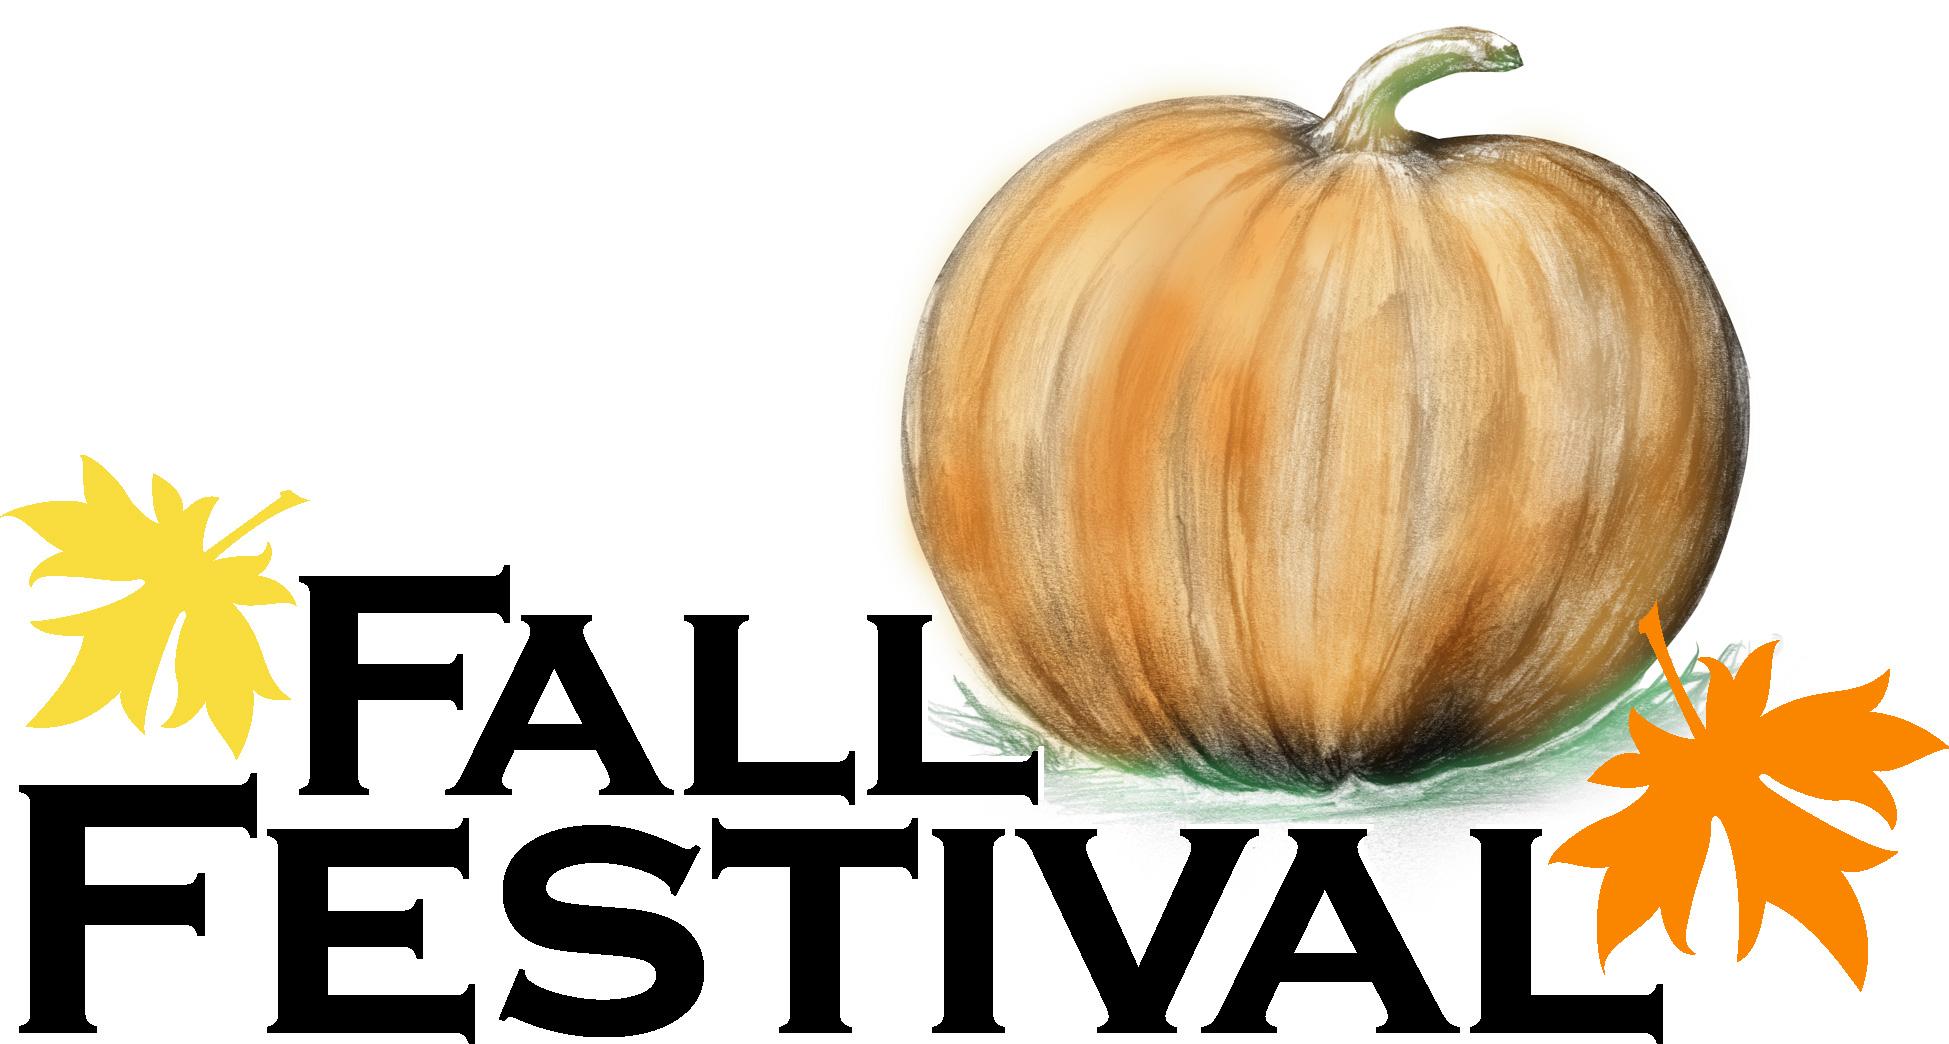 Fall festival fall family festival clipart